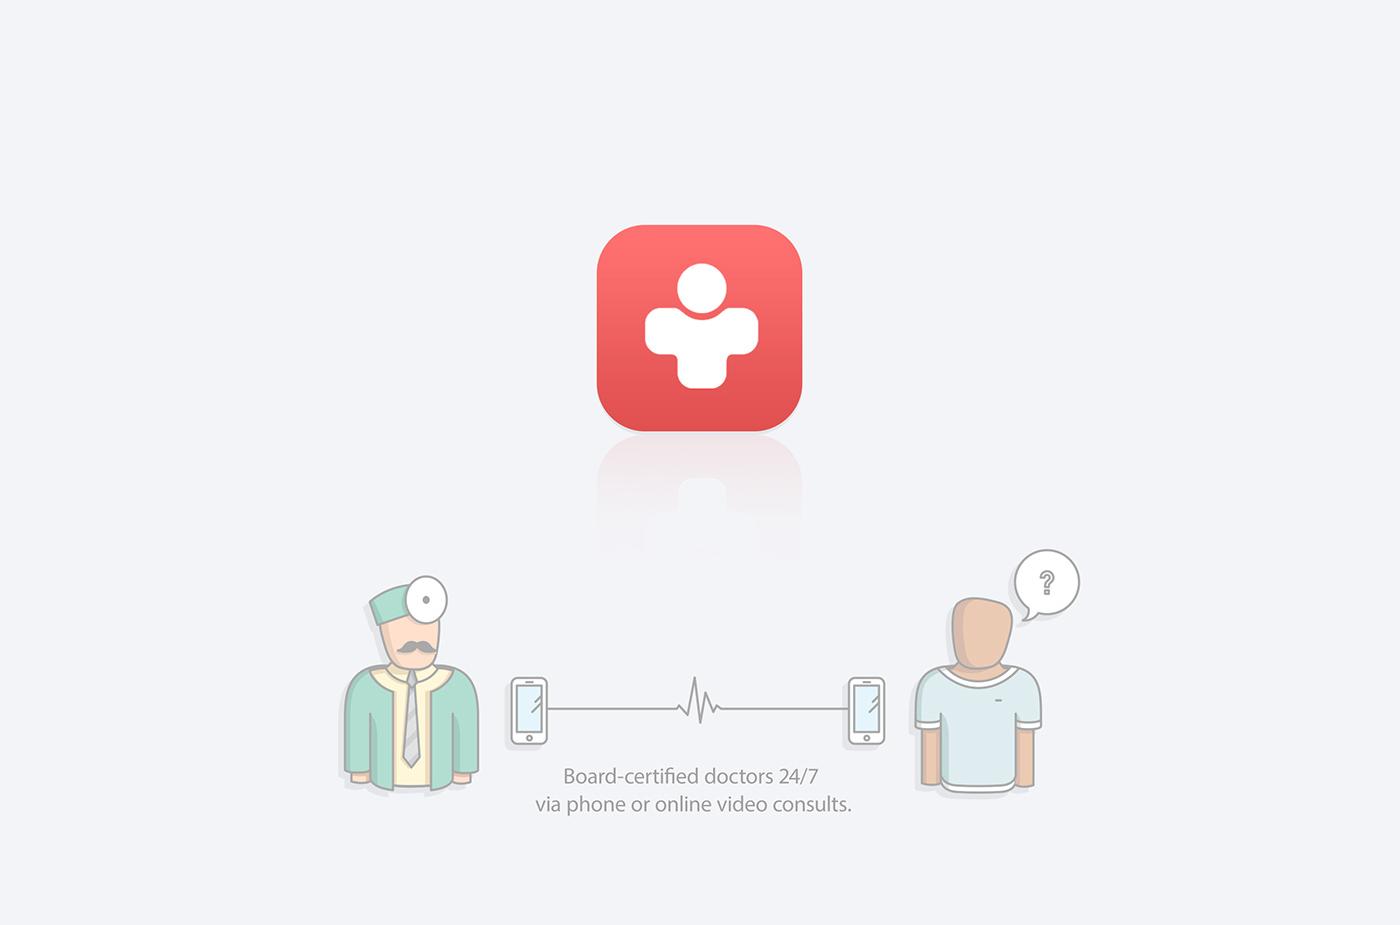 telemedical application doctors UI ux design medical medicine patients Medical app